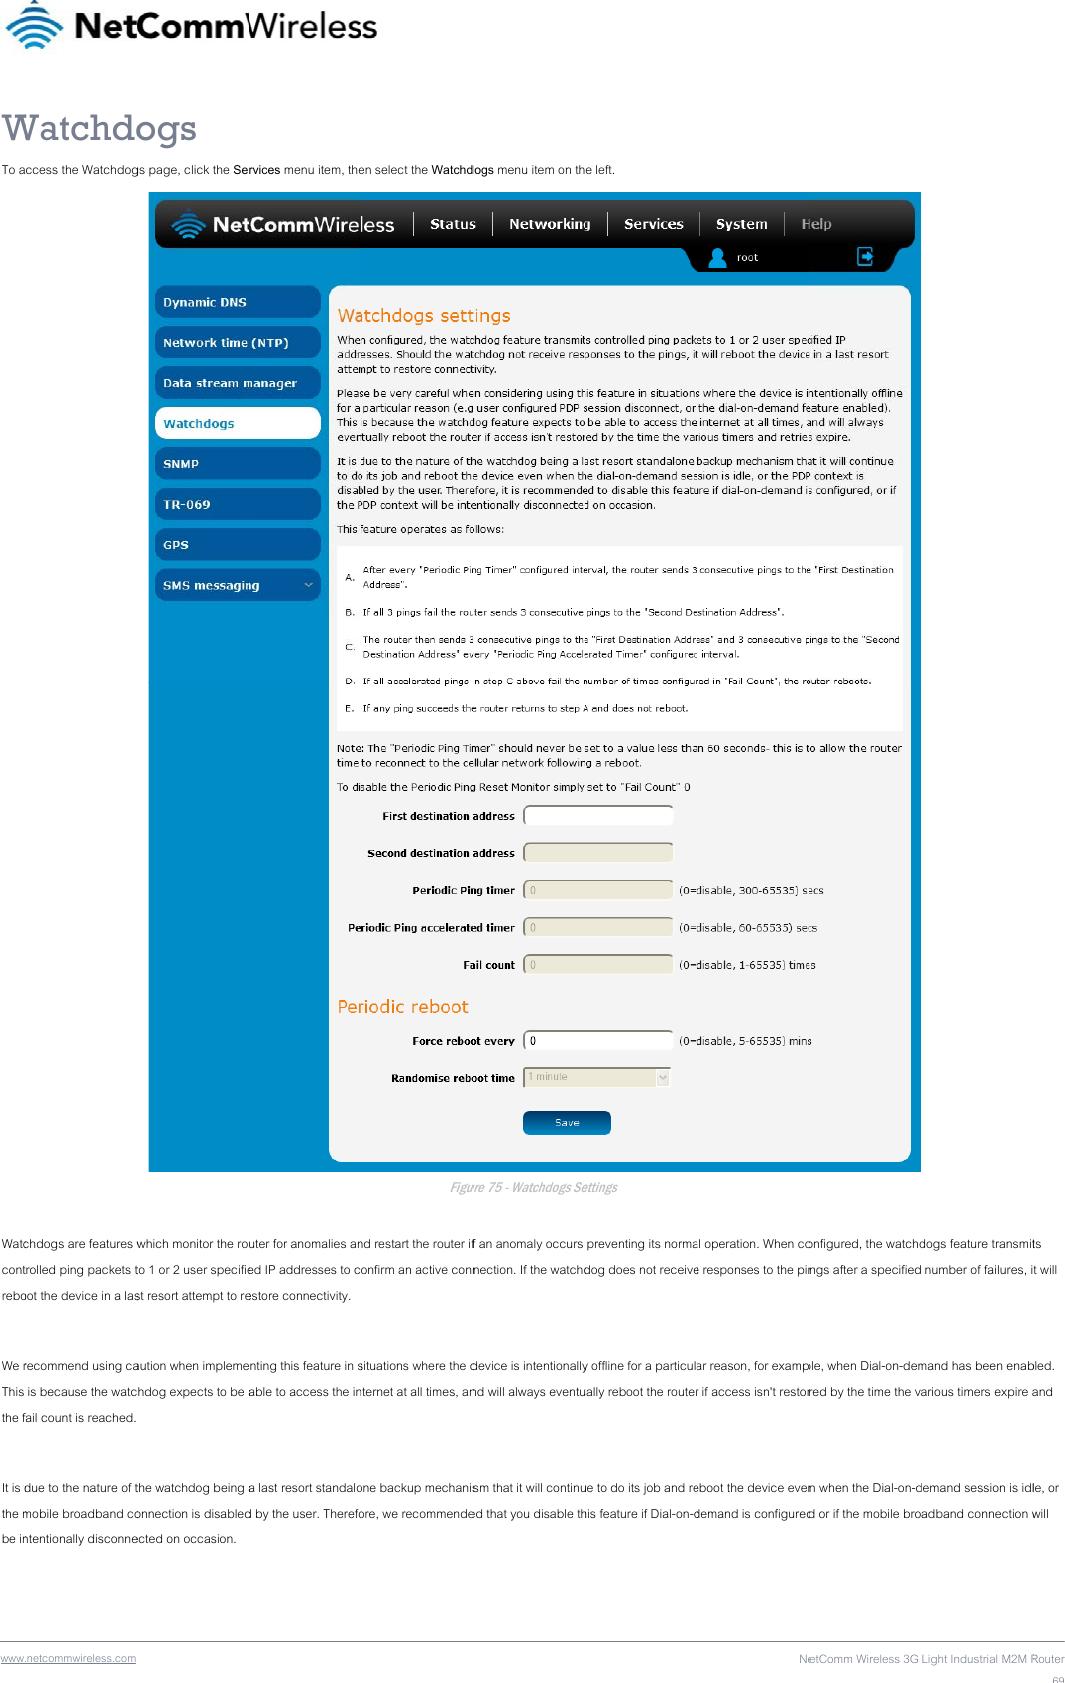 netcomm wireless 4g wifi m2m router manual